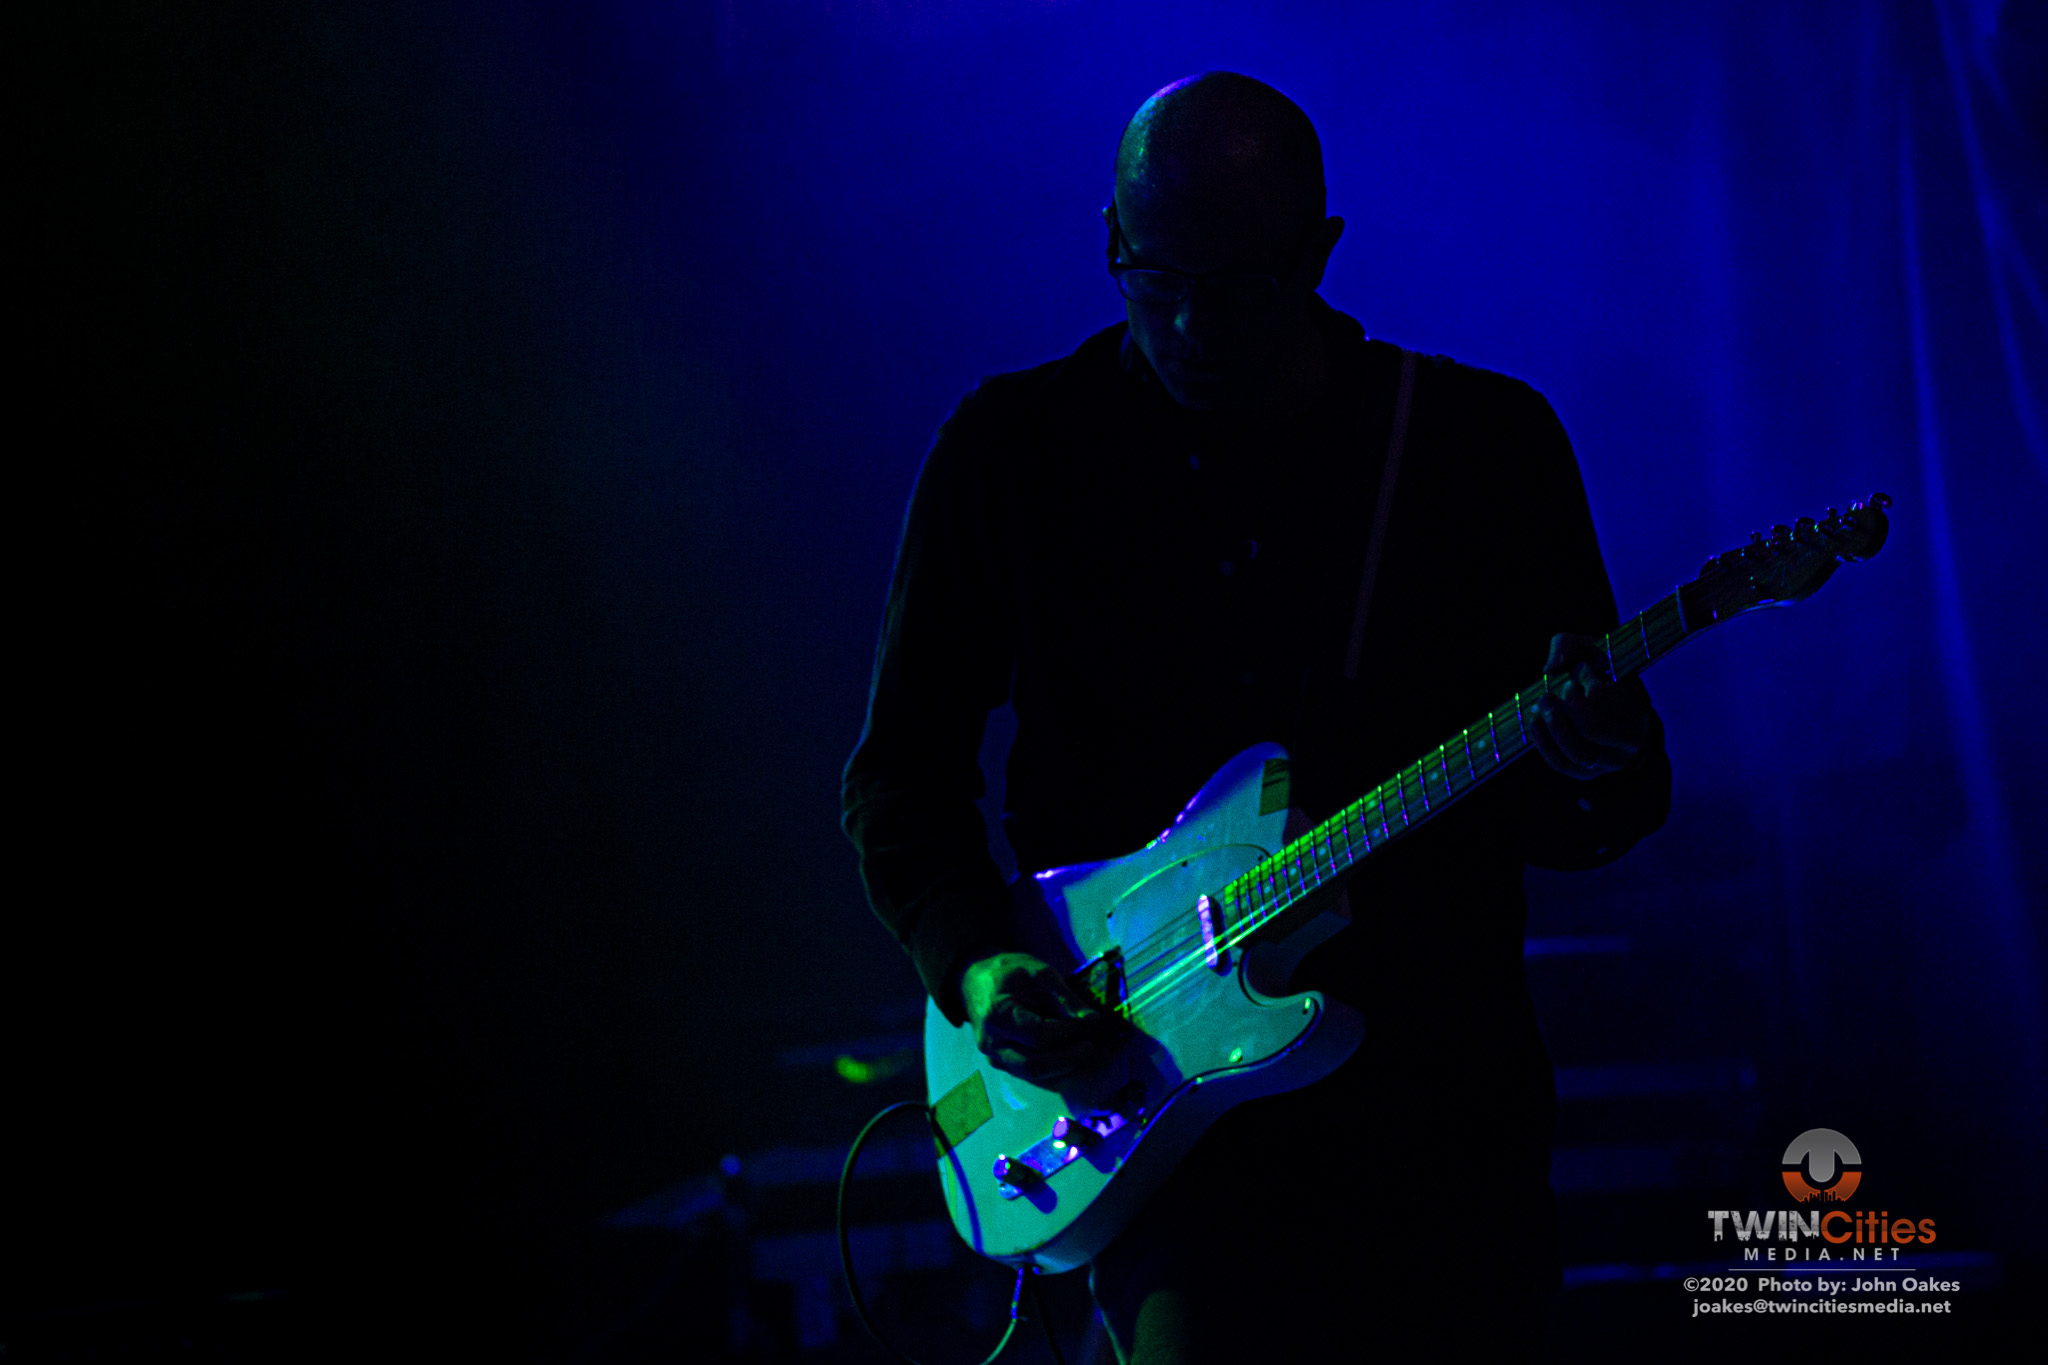 GreenBlue4